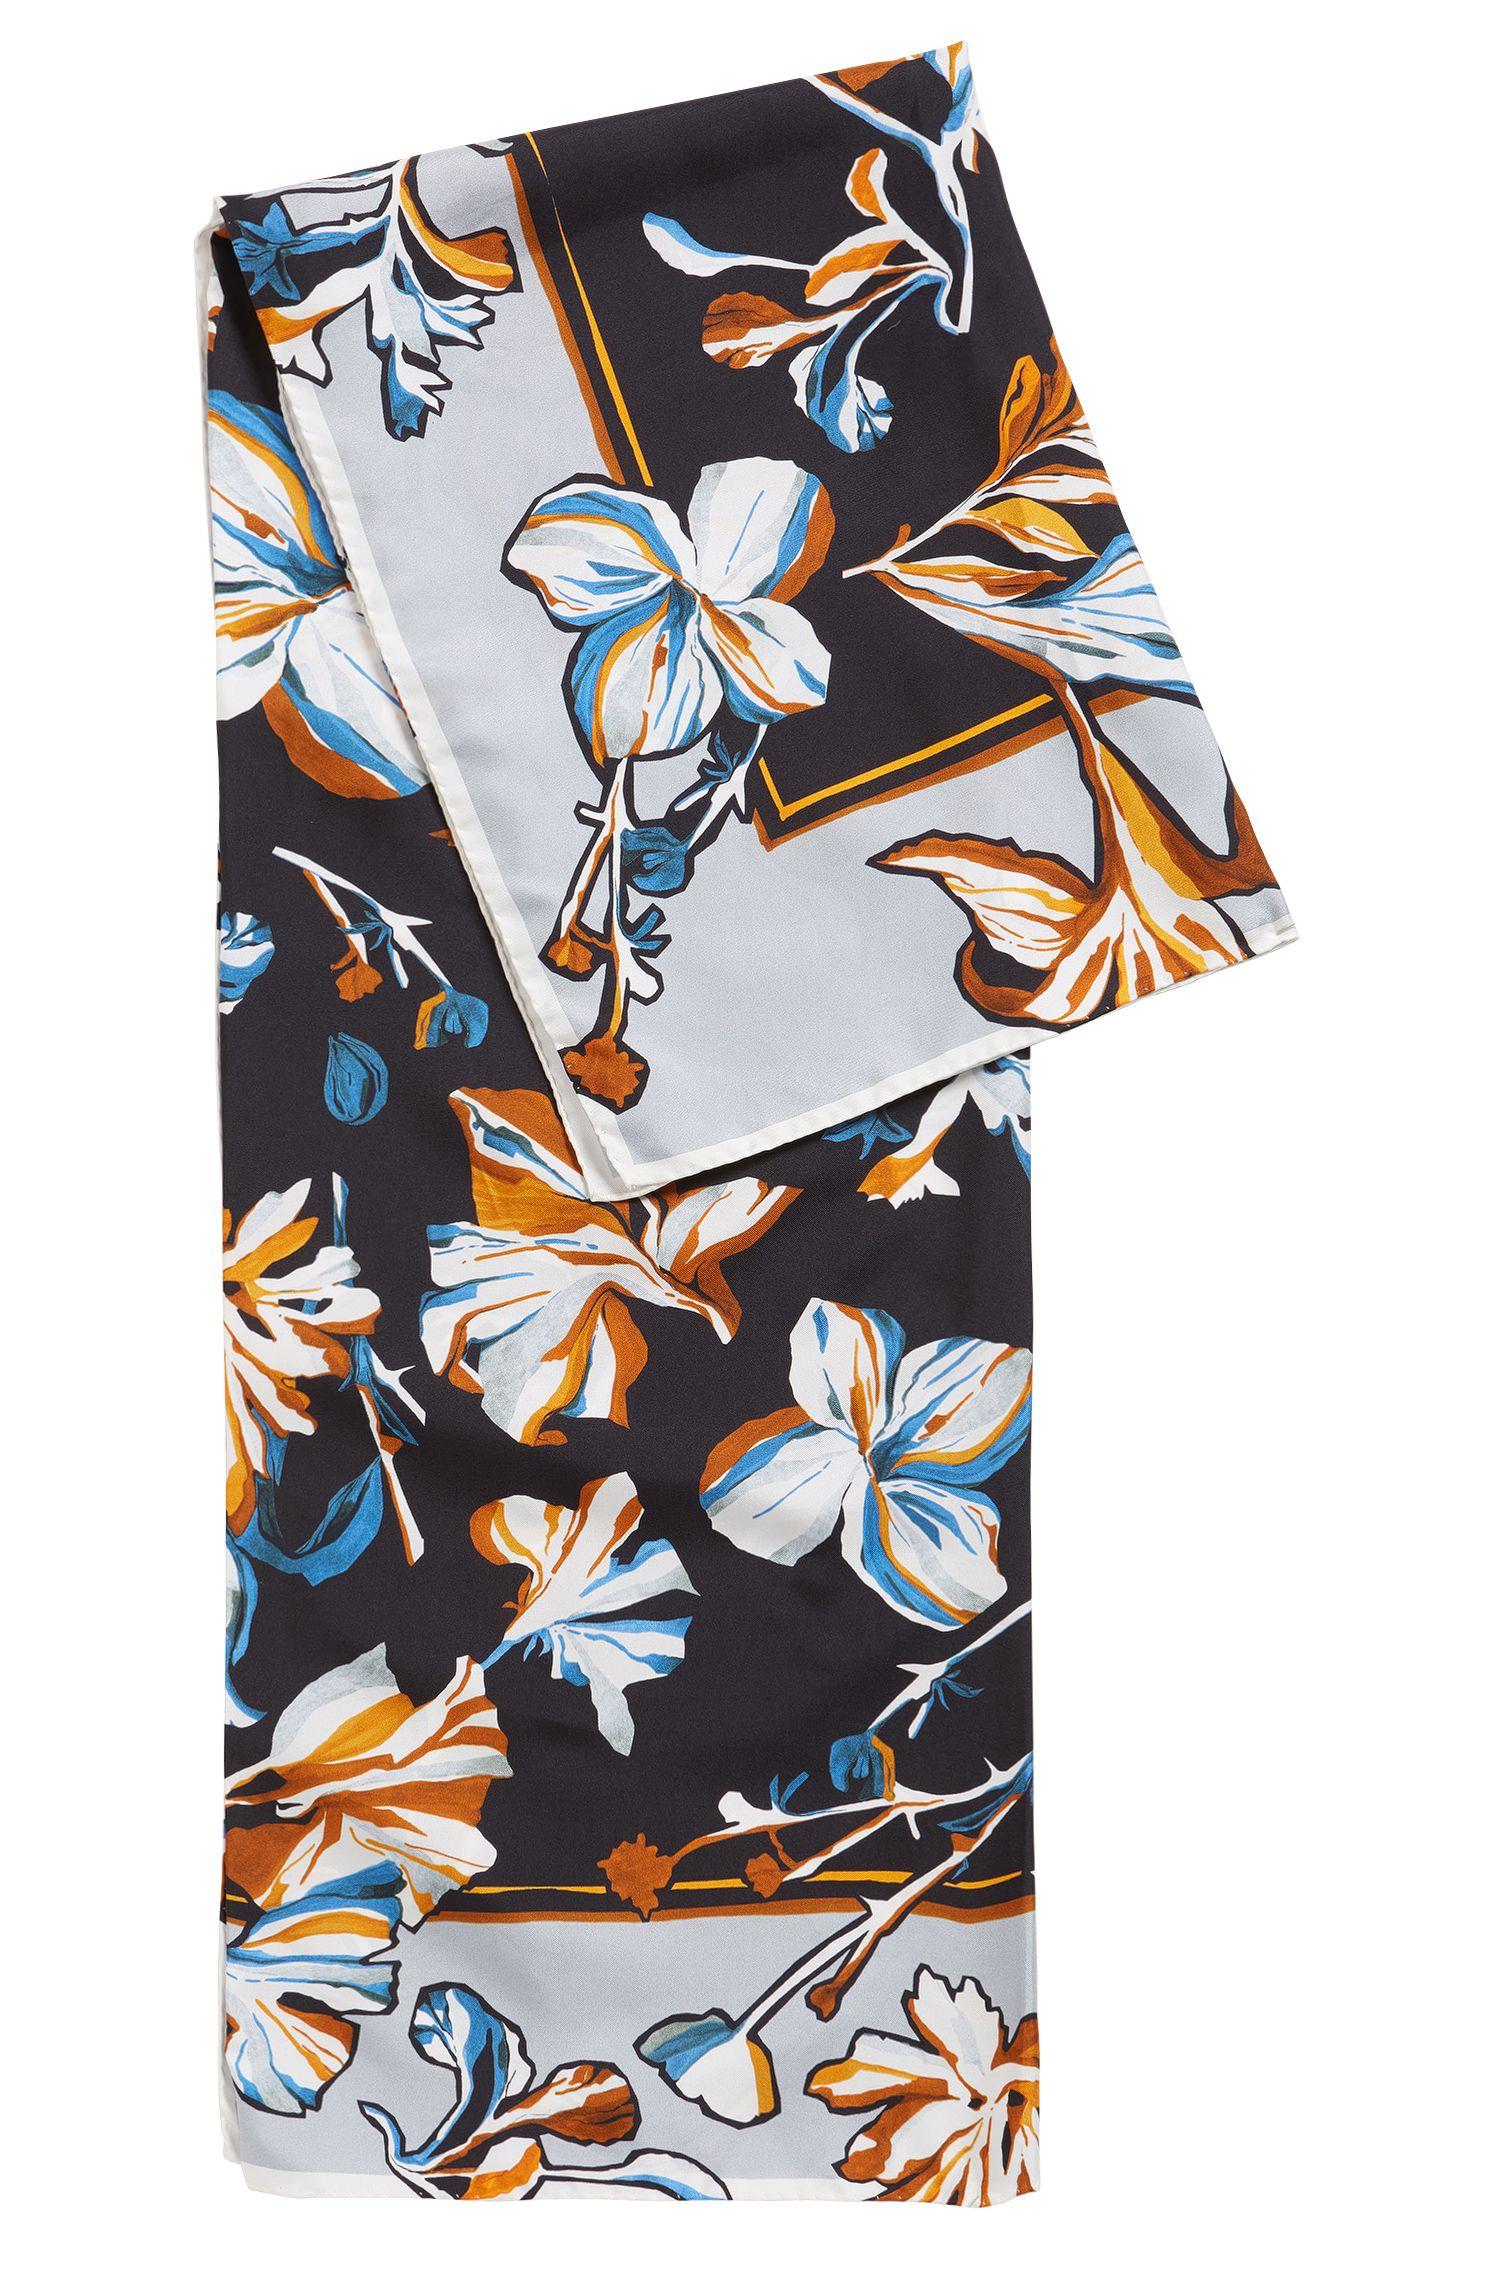 Bufanda de seda con flores pintadas a mano